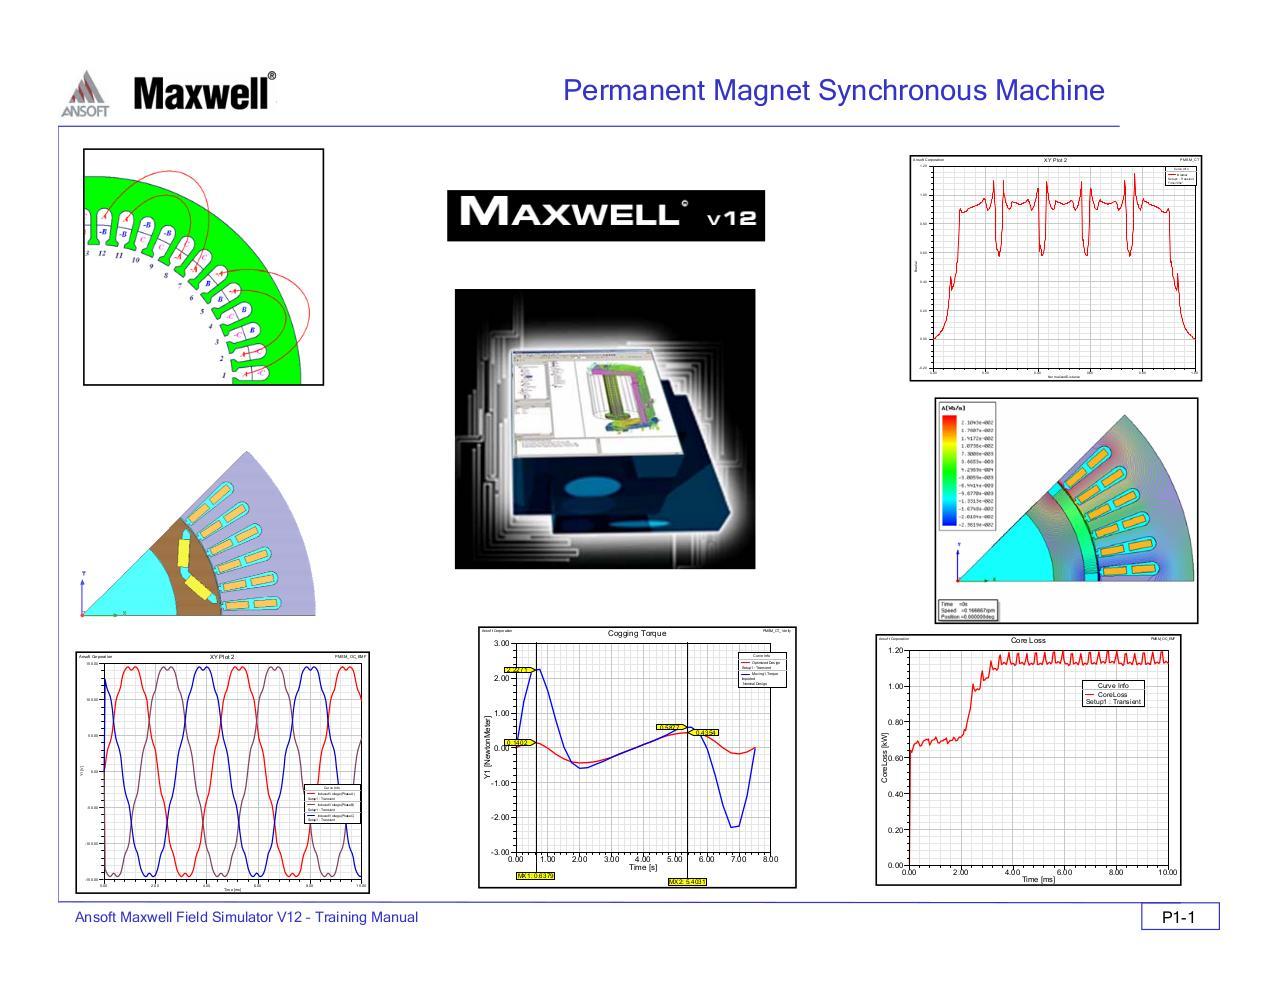 maxwell render manual 2.7 pdf